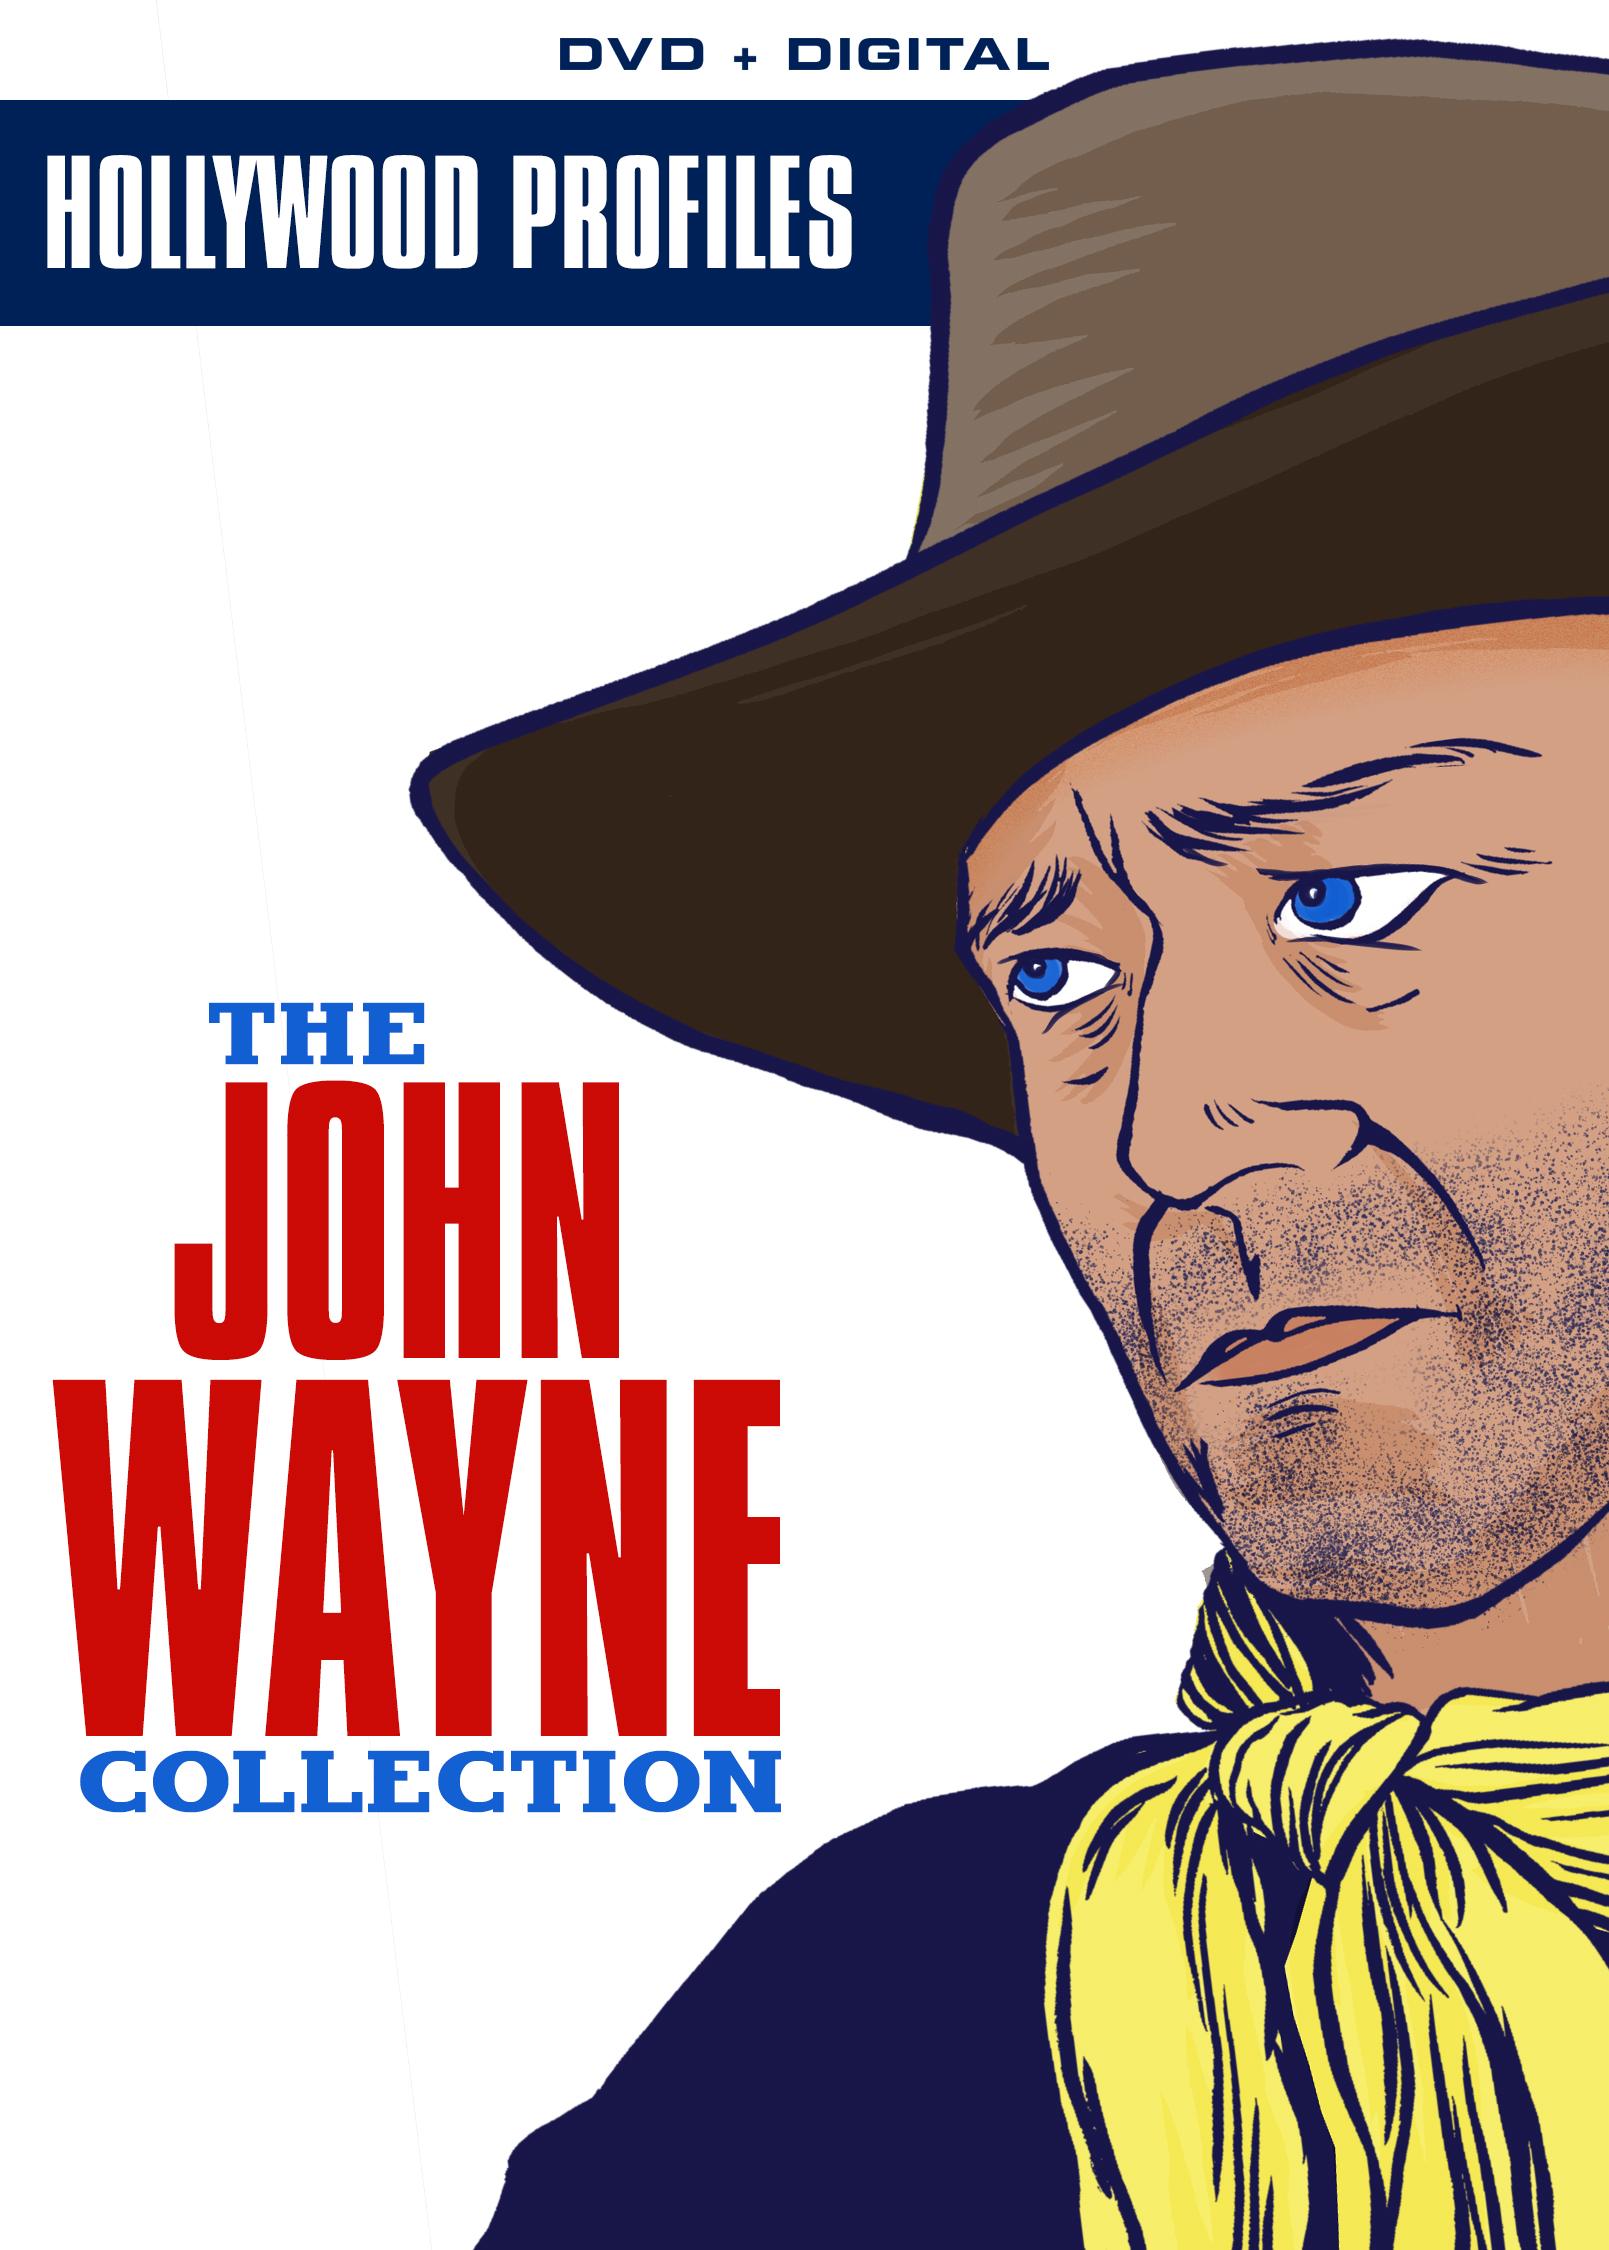 Hollywood Profiles - John Wayne